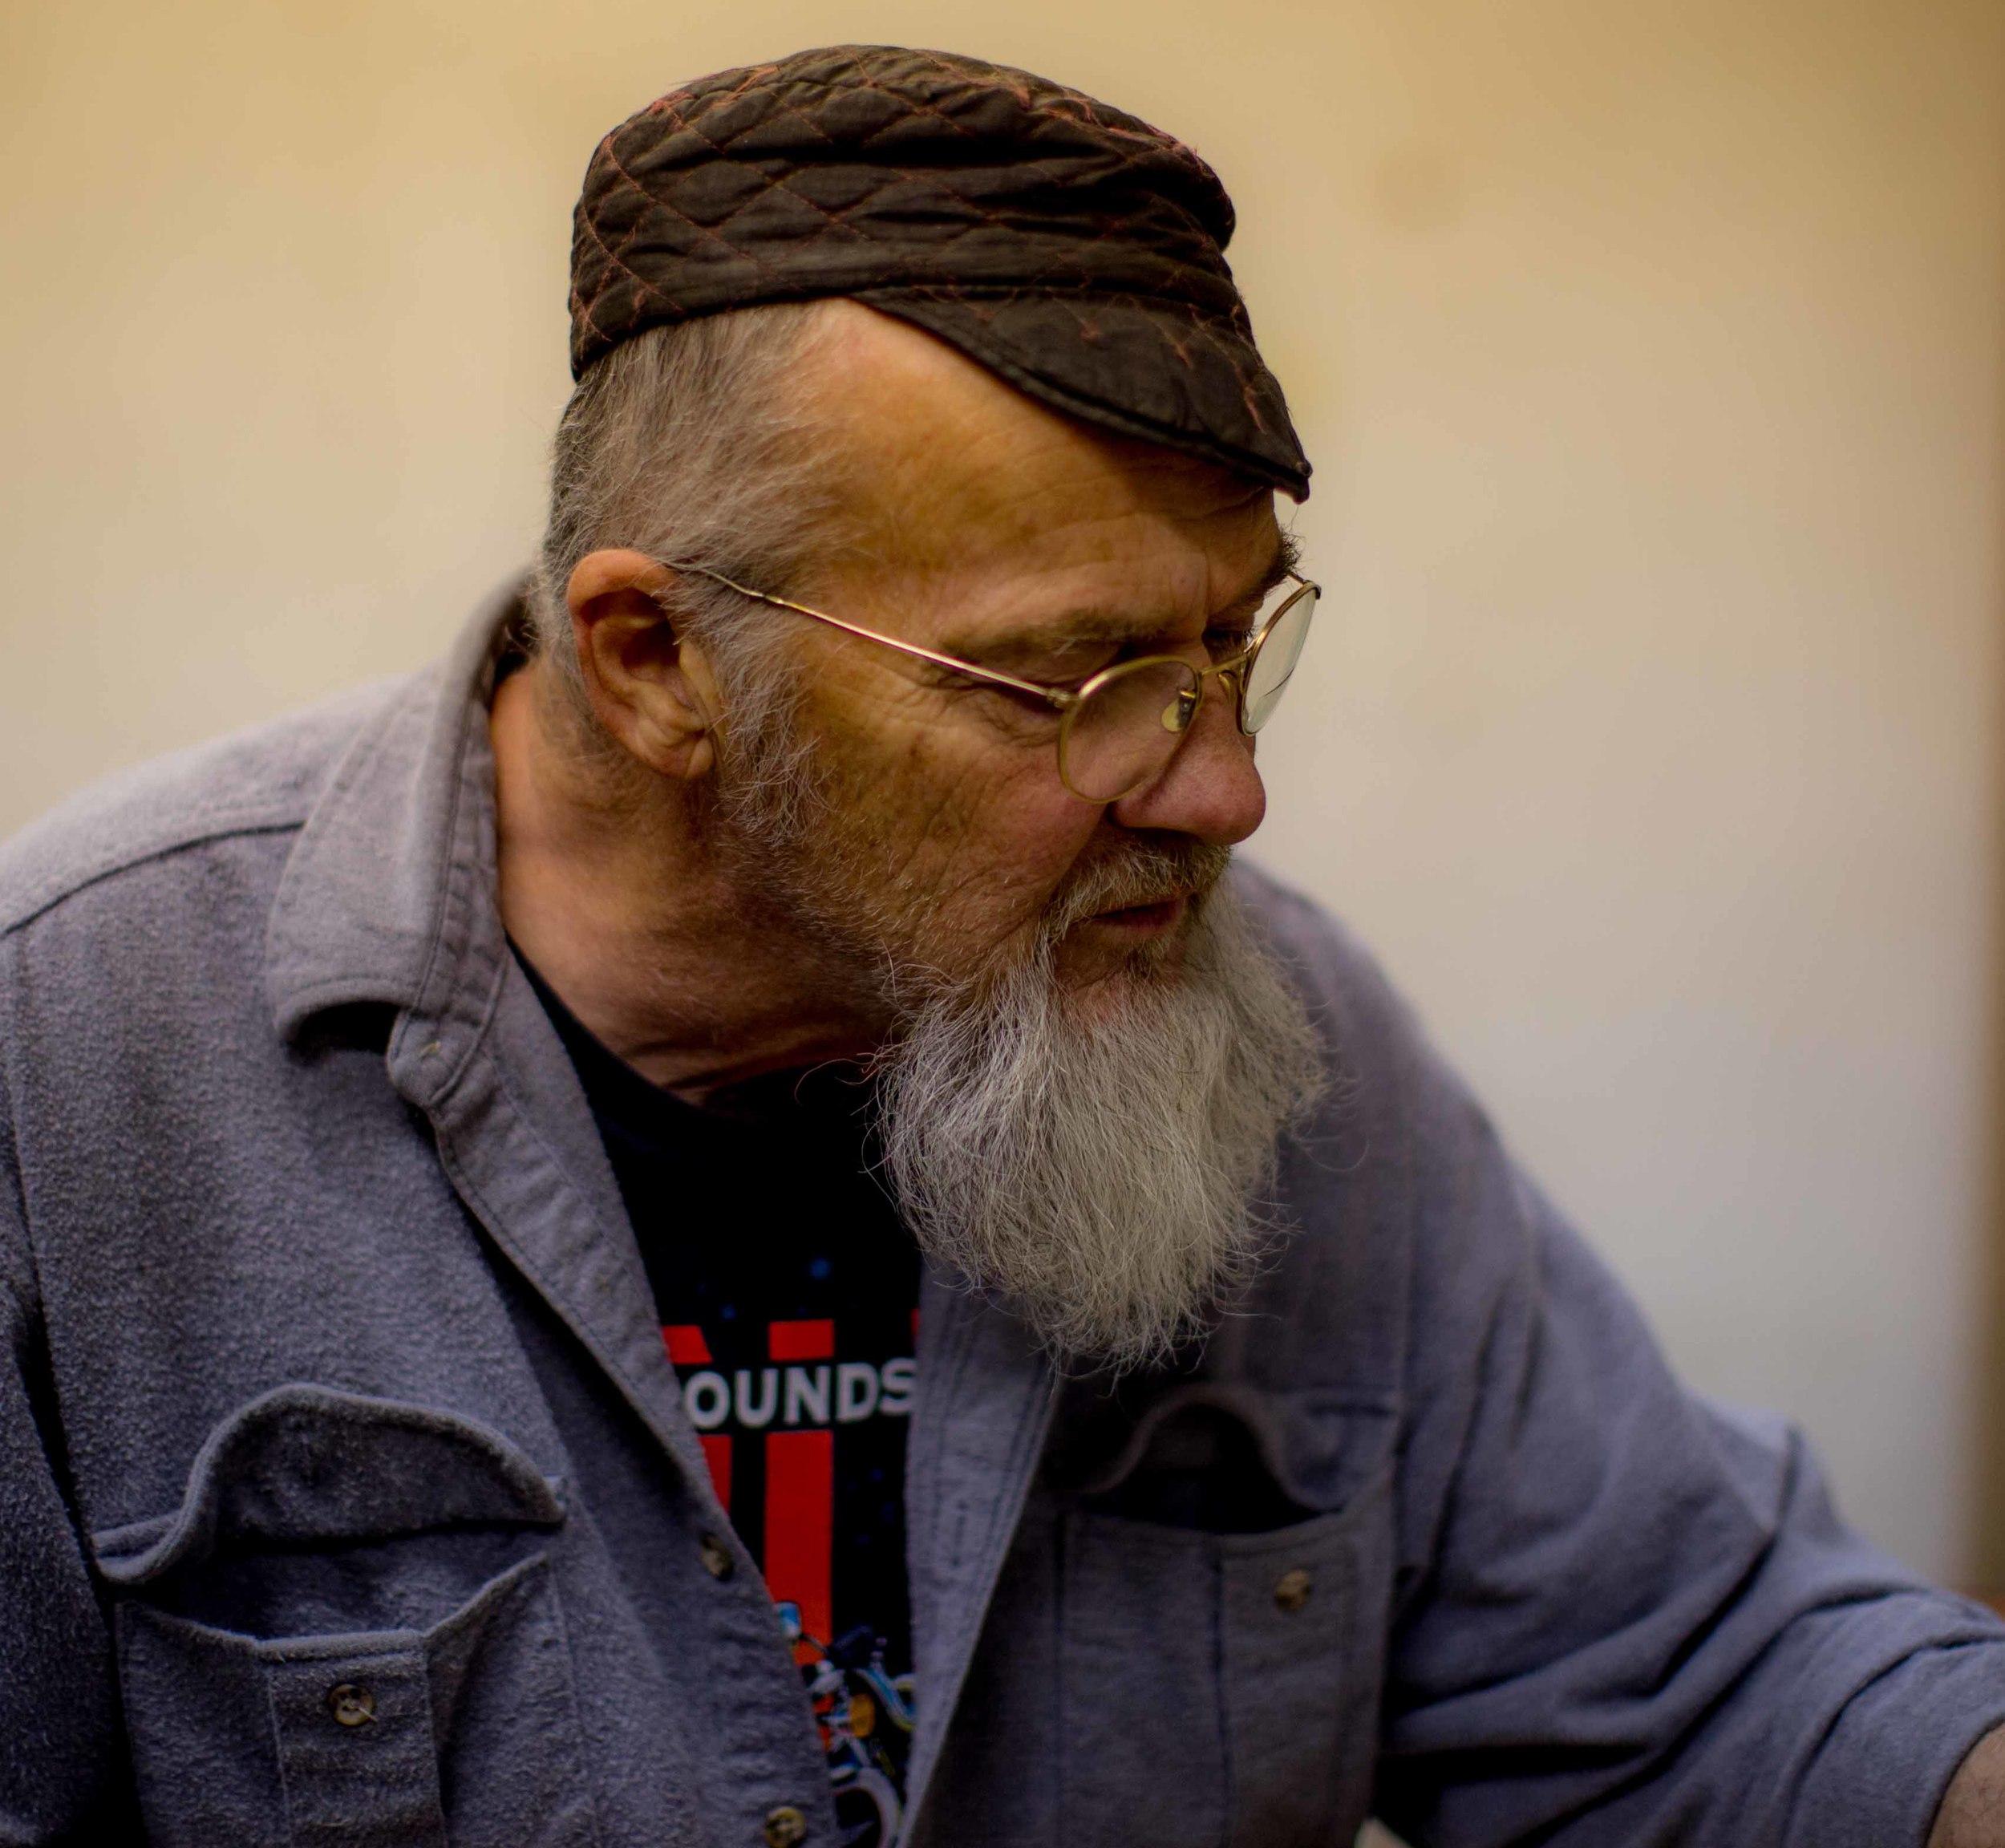 Dick Cross, local Bronze Artist and creator of the Life size Bronze Bike